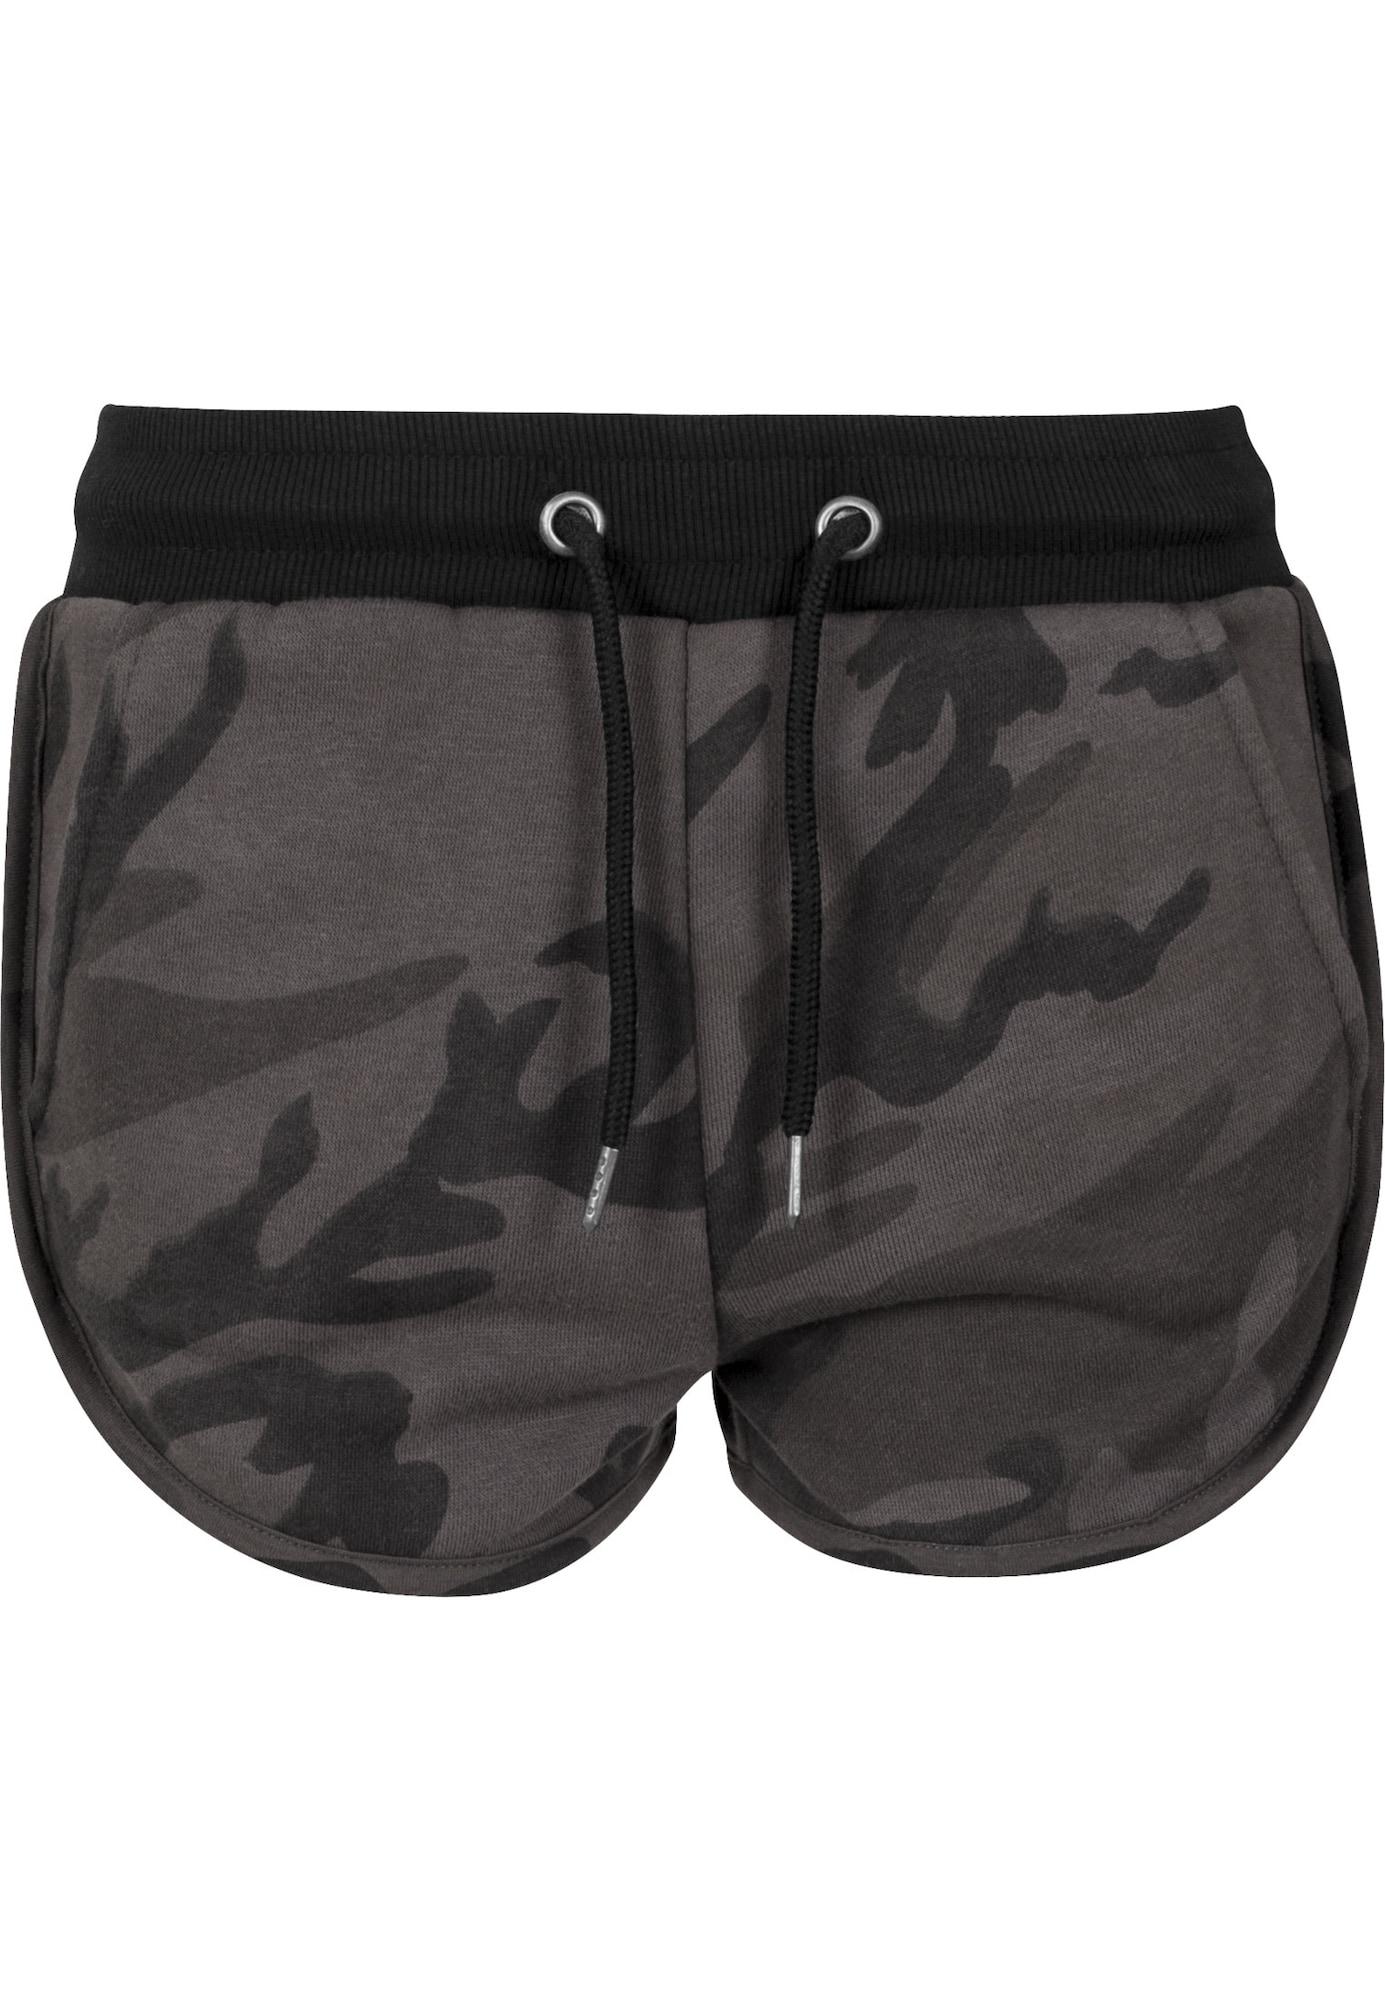 Urban Classics Kalhoty 'Camo'  tmavě šedá / černá